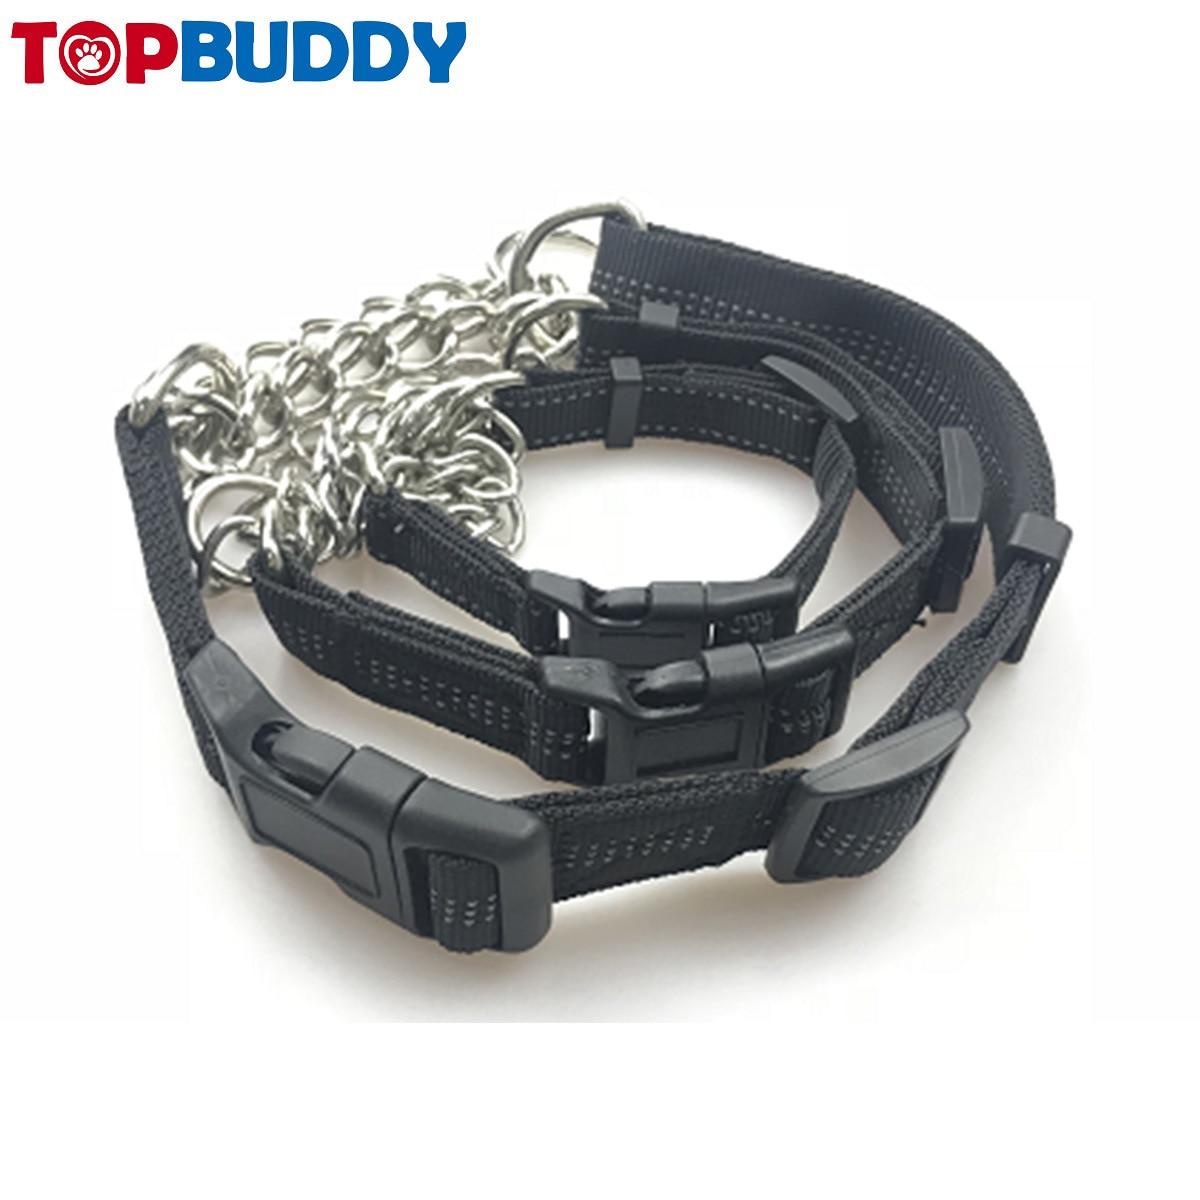 Pet Supplies Dog Nylon Iron Chain Neck Ring And Medium-sized Dog Anti-Bite Dog Chain Dog Neck Ring Dog Extendable Xun Gou Lian